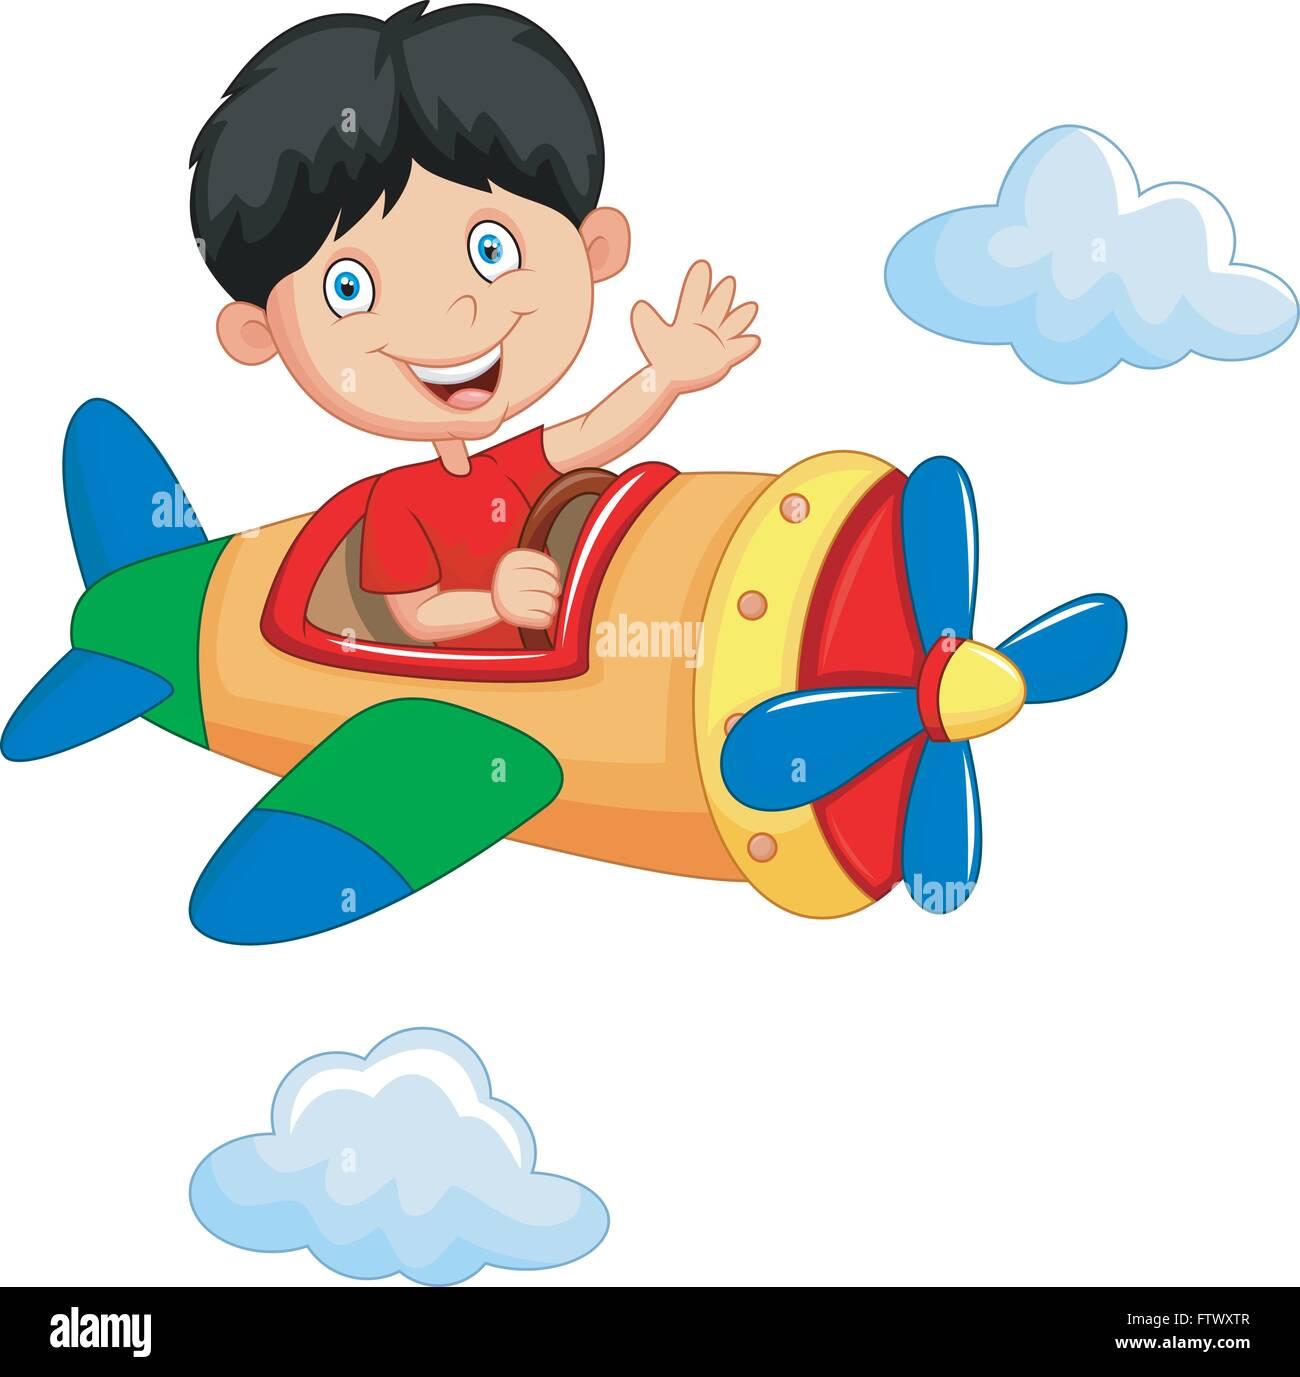 Cartoon Boy Riding Airplane Stock Vector Image Art Alamy